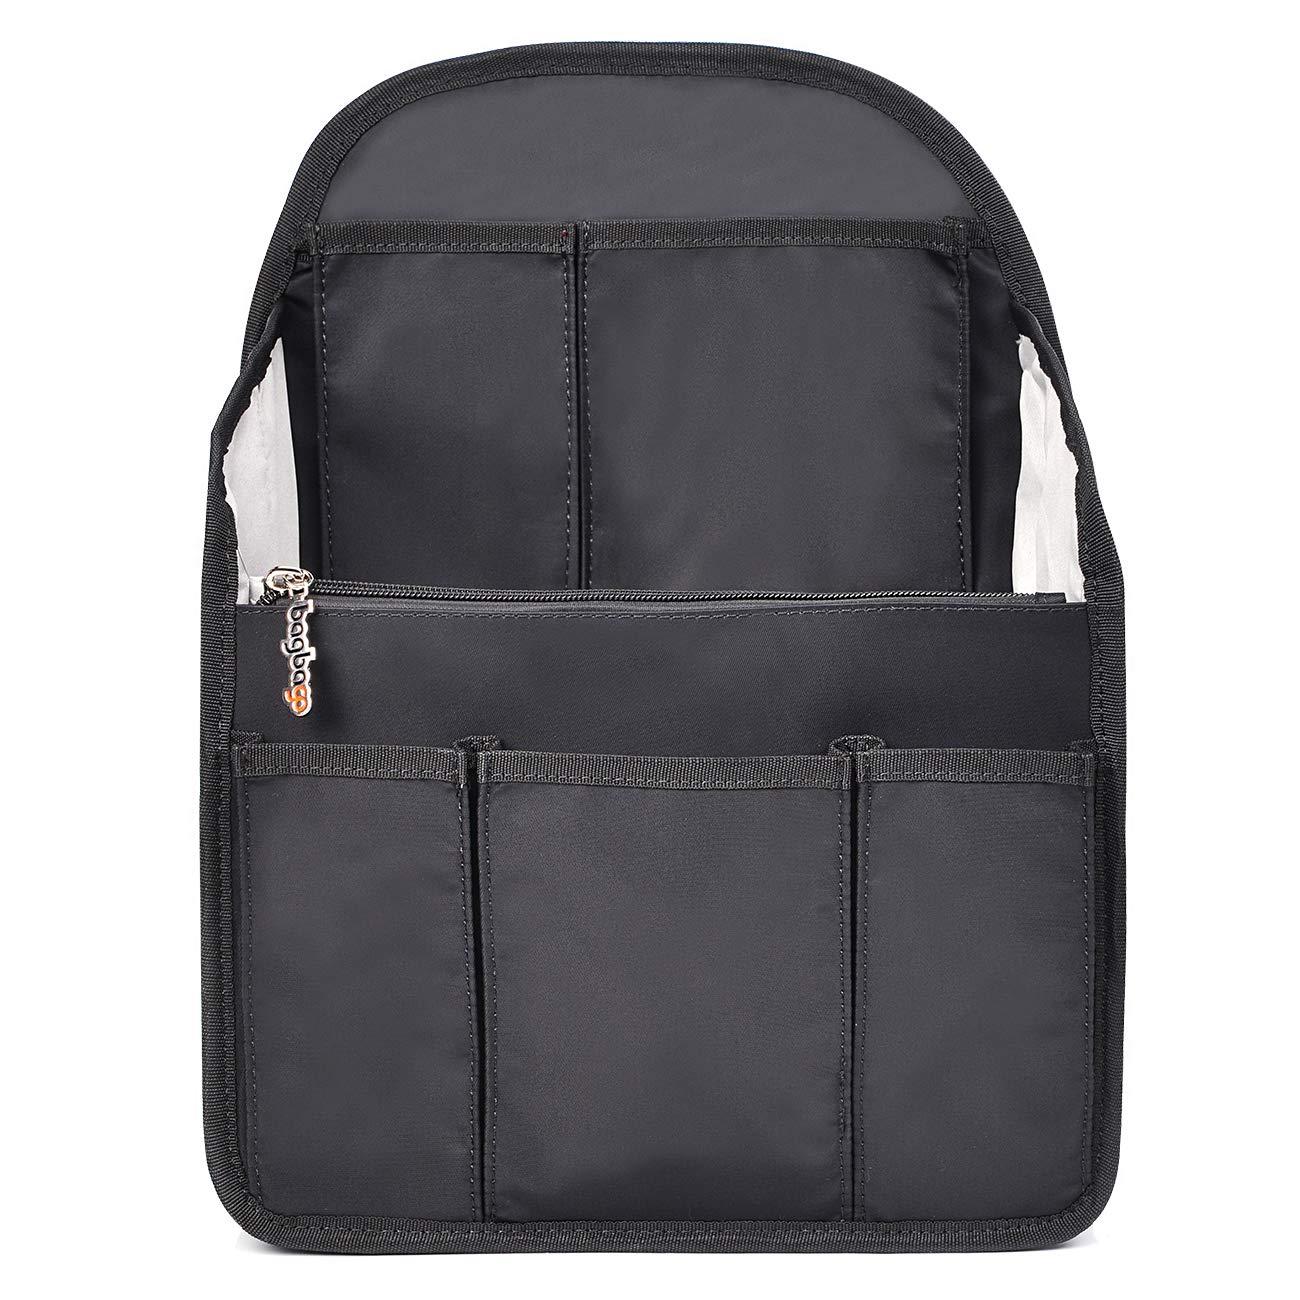 BES CHAN Backpack Insert Organizer Handbag Organizer Diaper Bag Gadget Organization (L(Diaper Insert Bag))